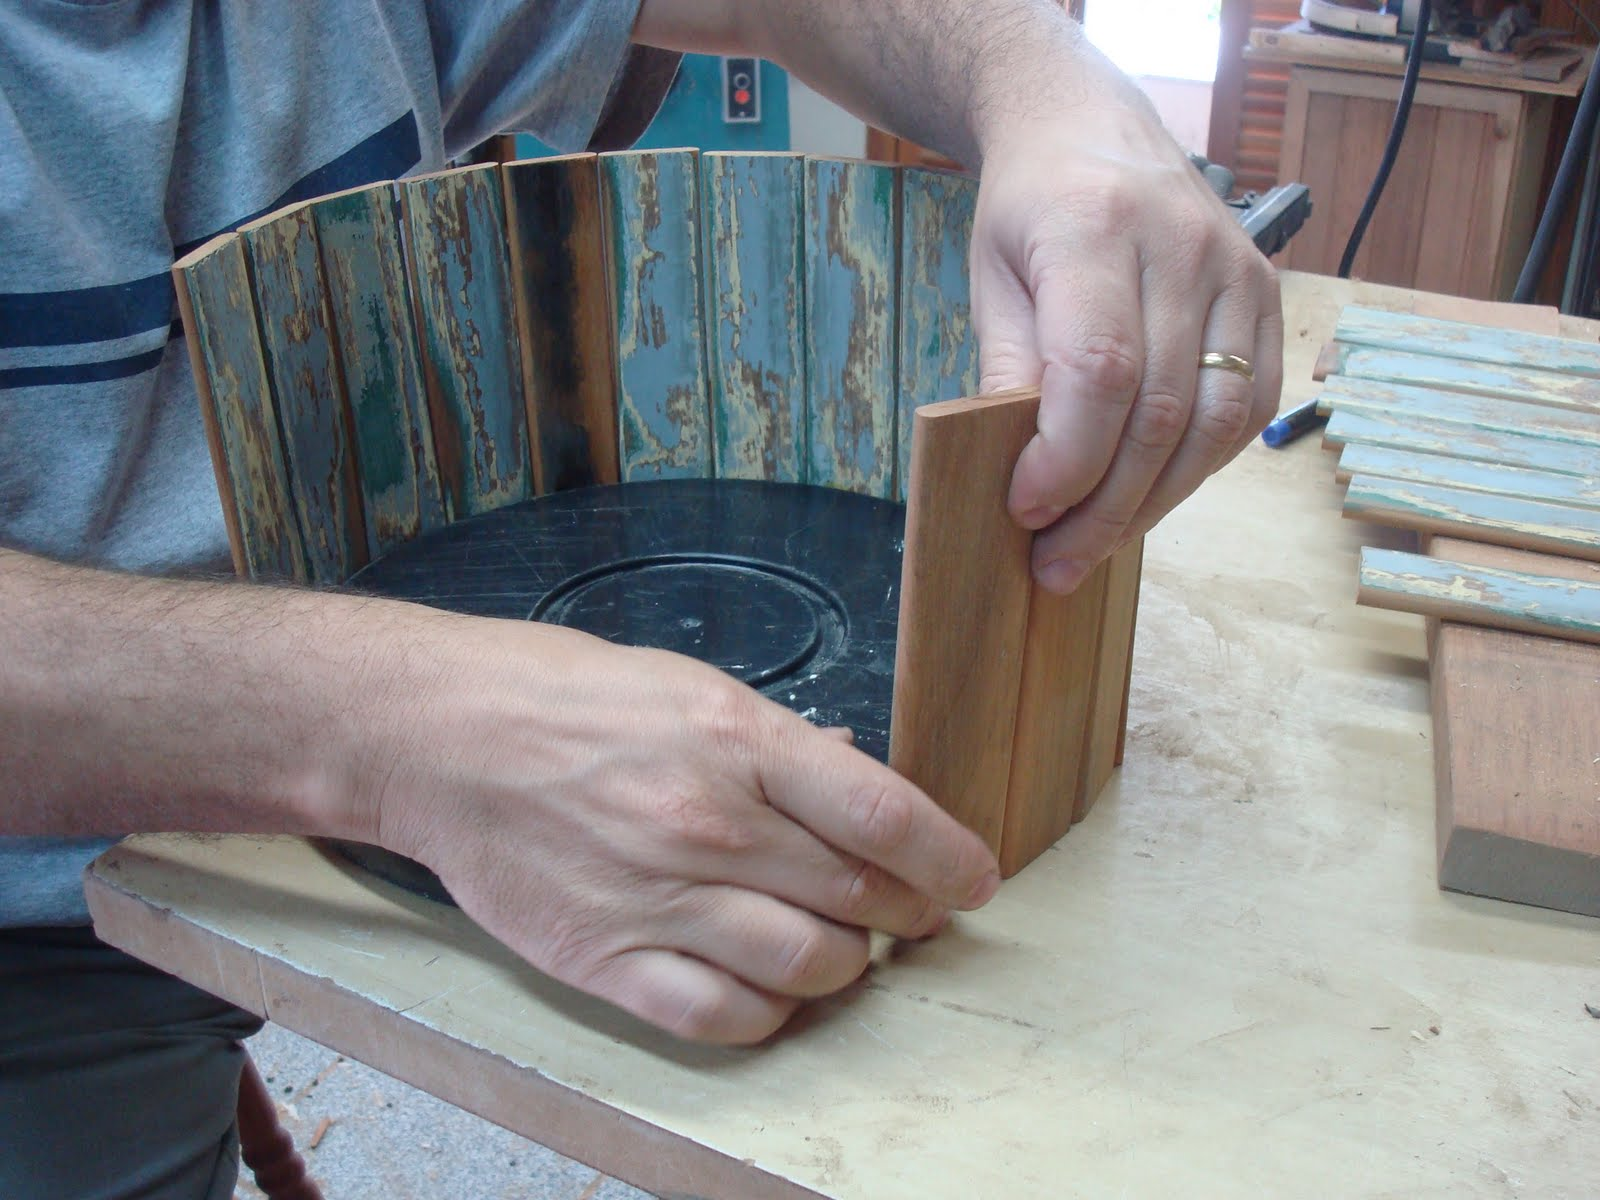 Zero: Vaso (cachepo) para pendurar feito de madeira (FAÇA VOCE MESMO #46677A 1600x1200